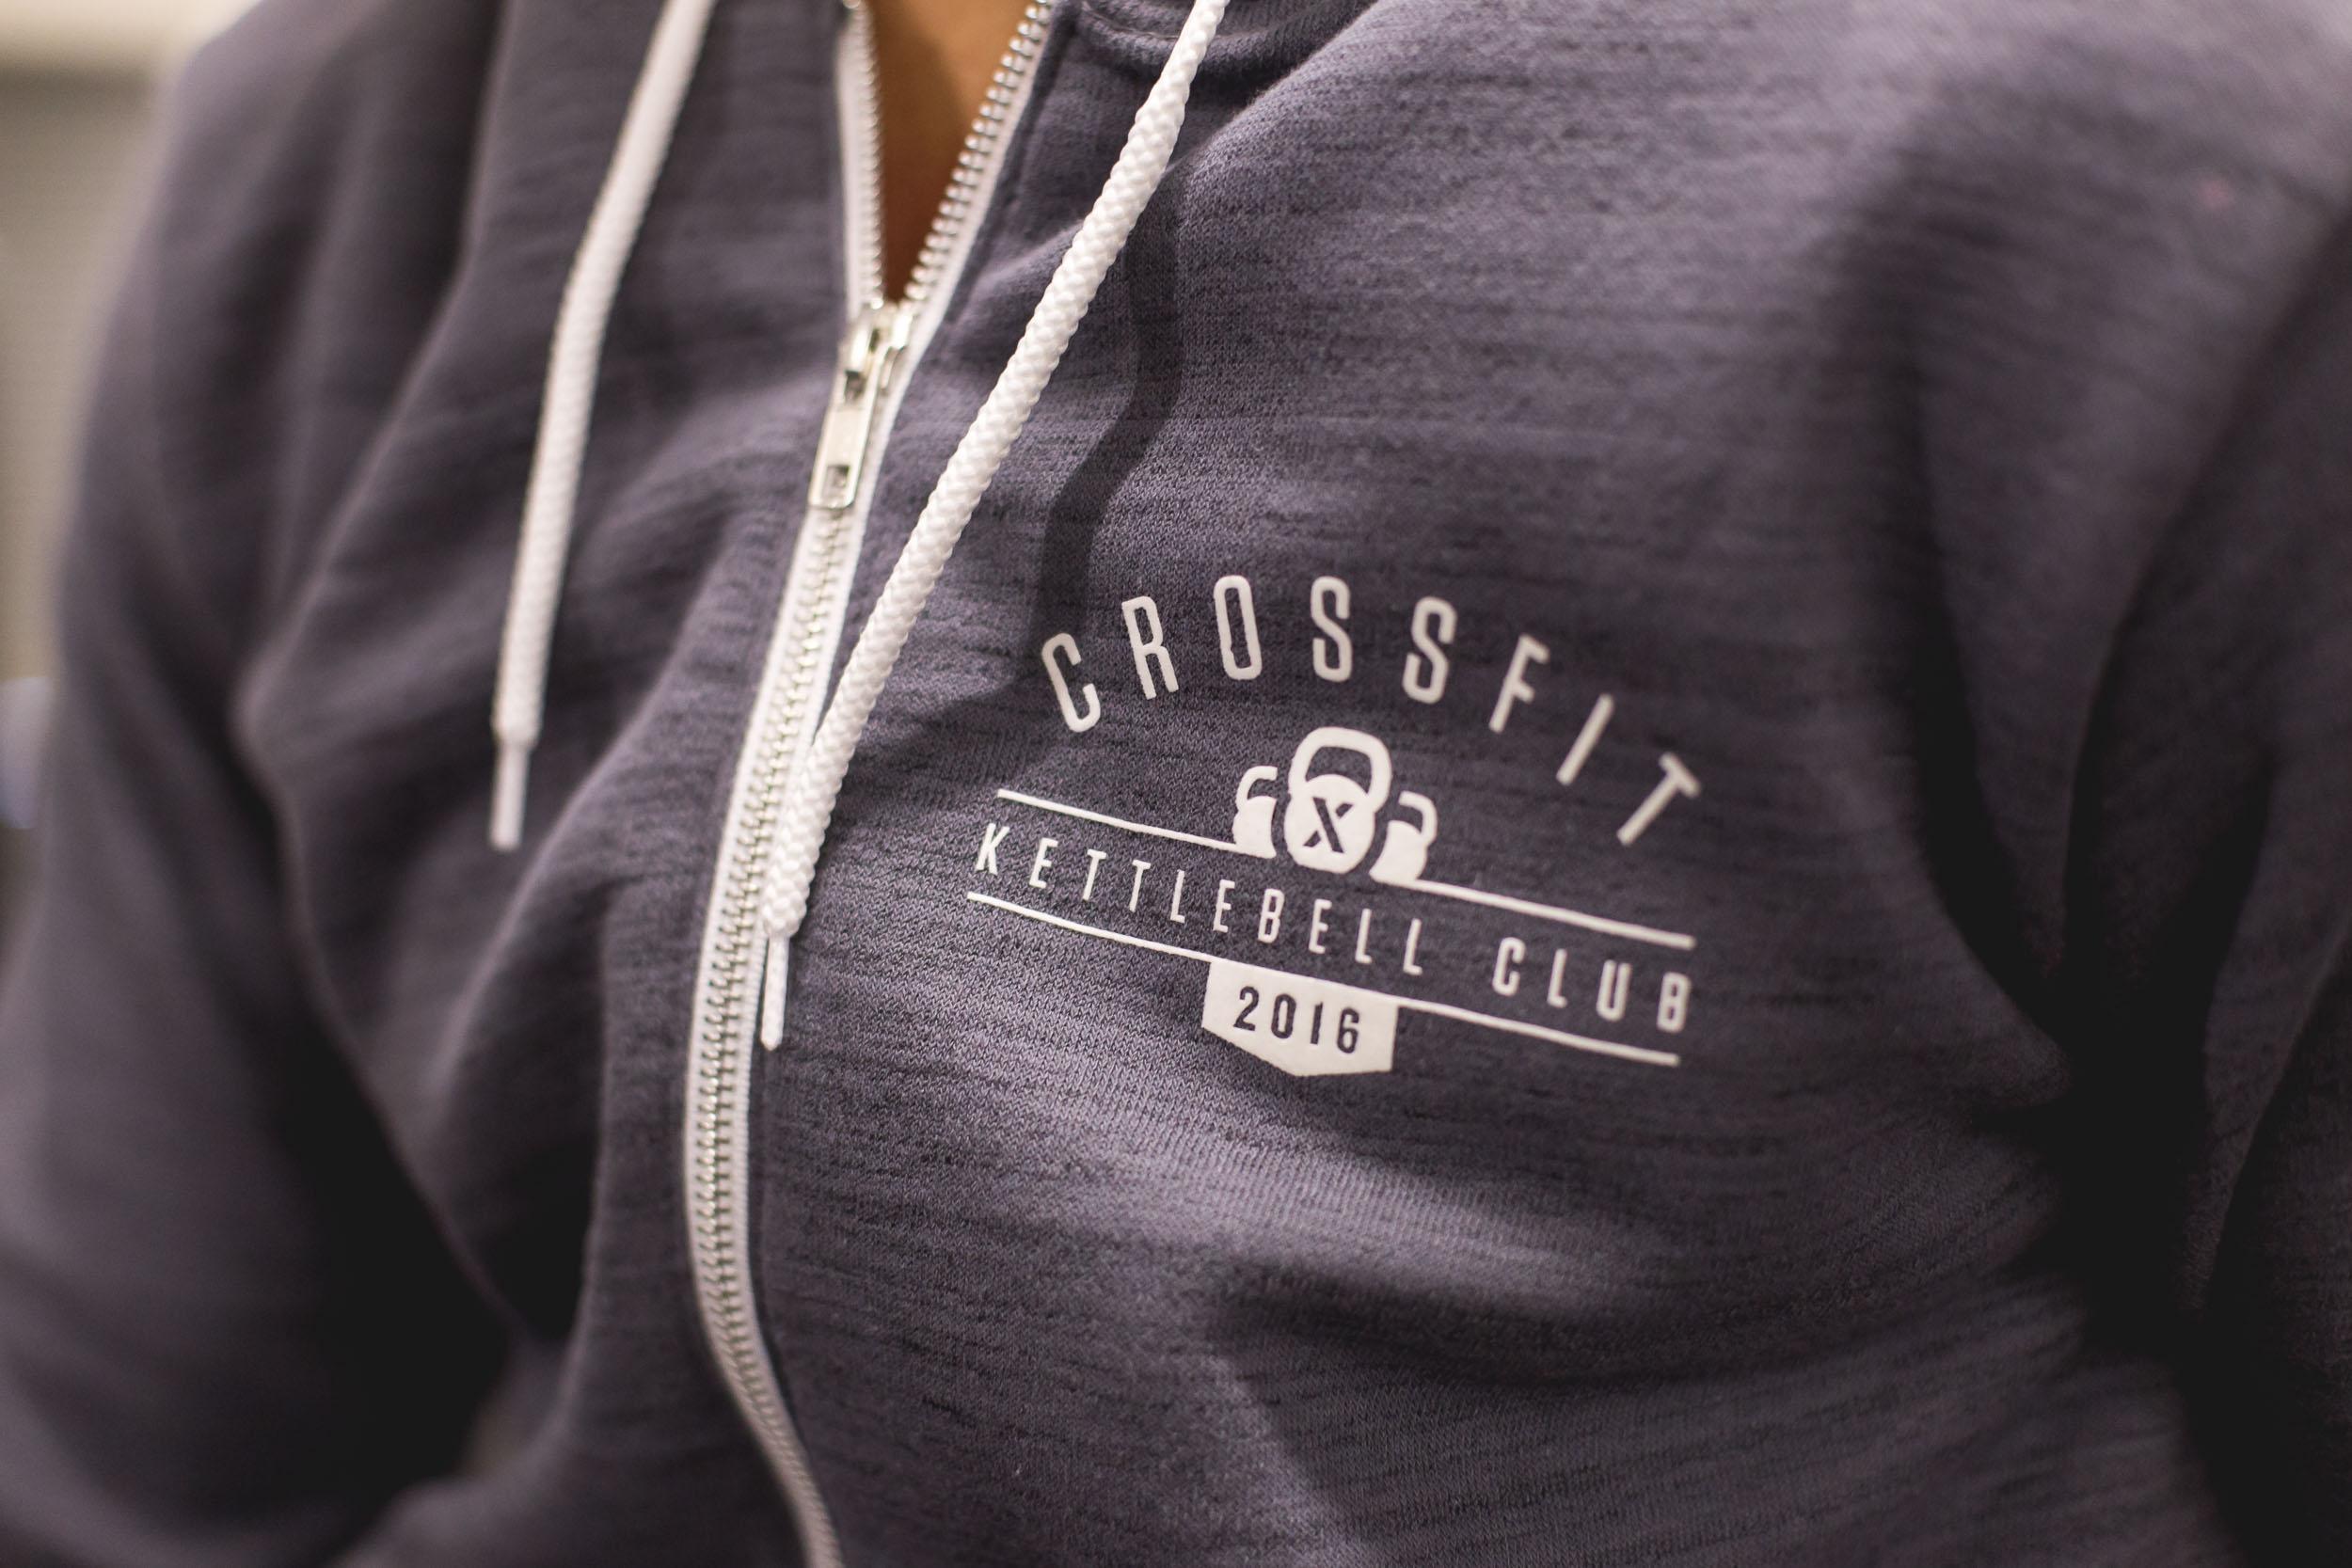 Crossfit UK printed clothing t-shirts-0042.jpg